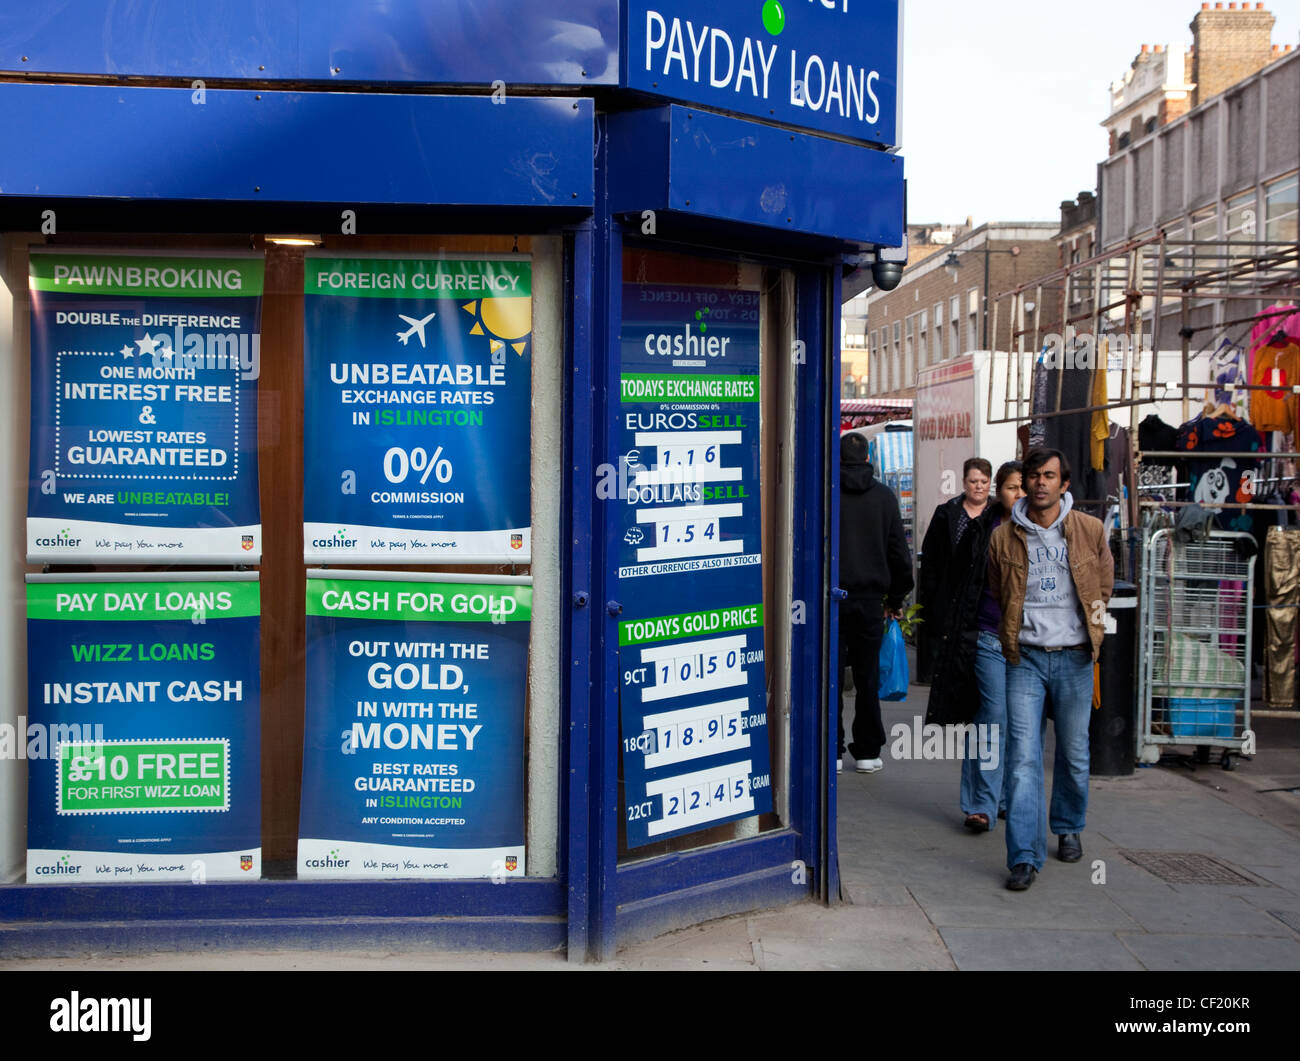 Cash advance td bank image 7